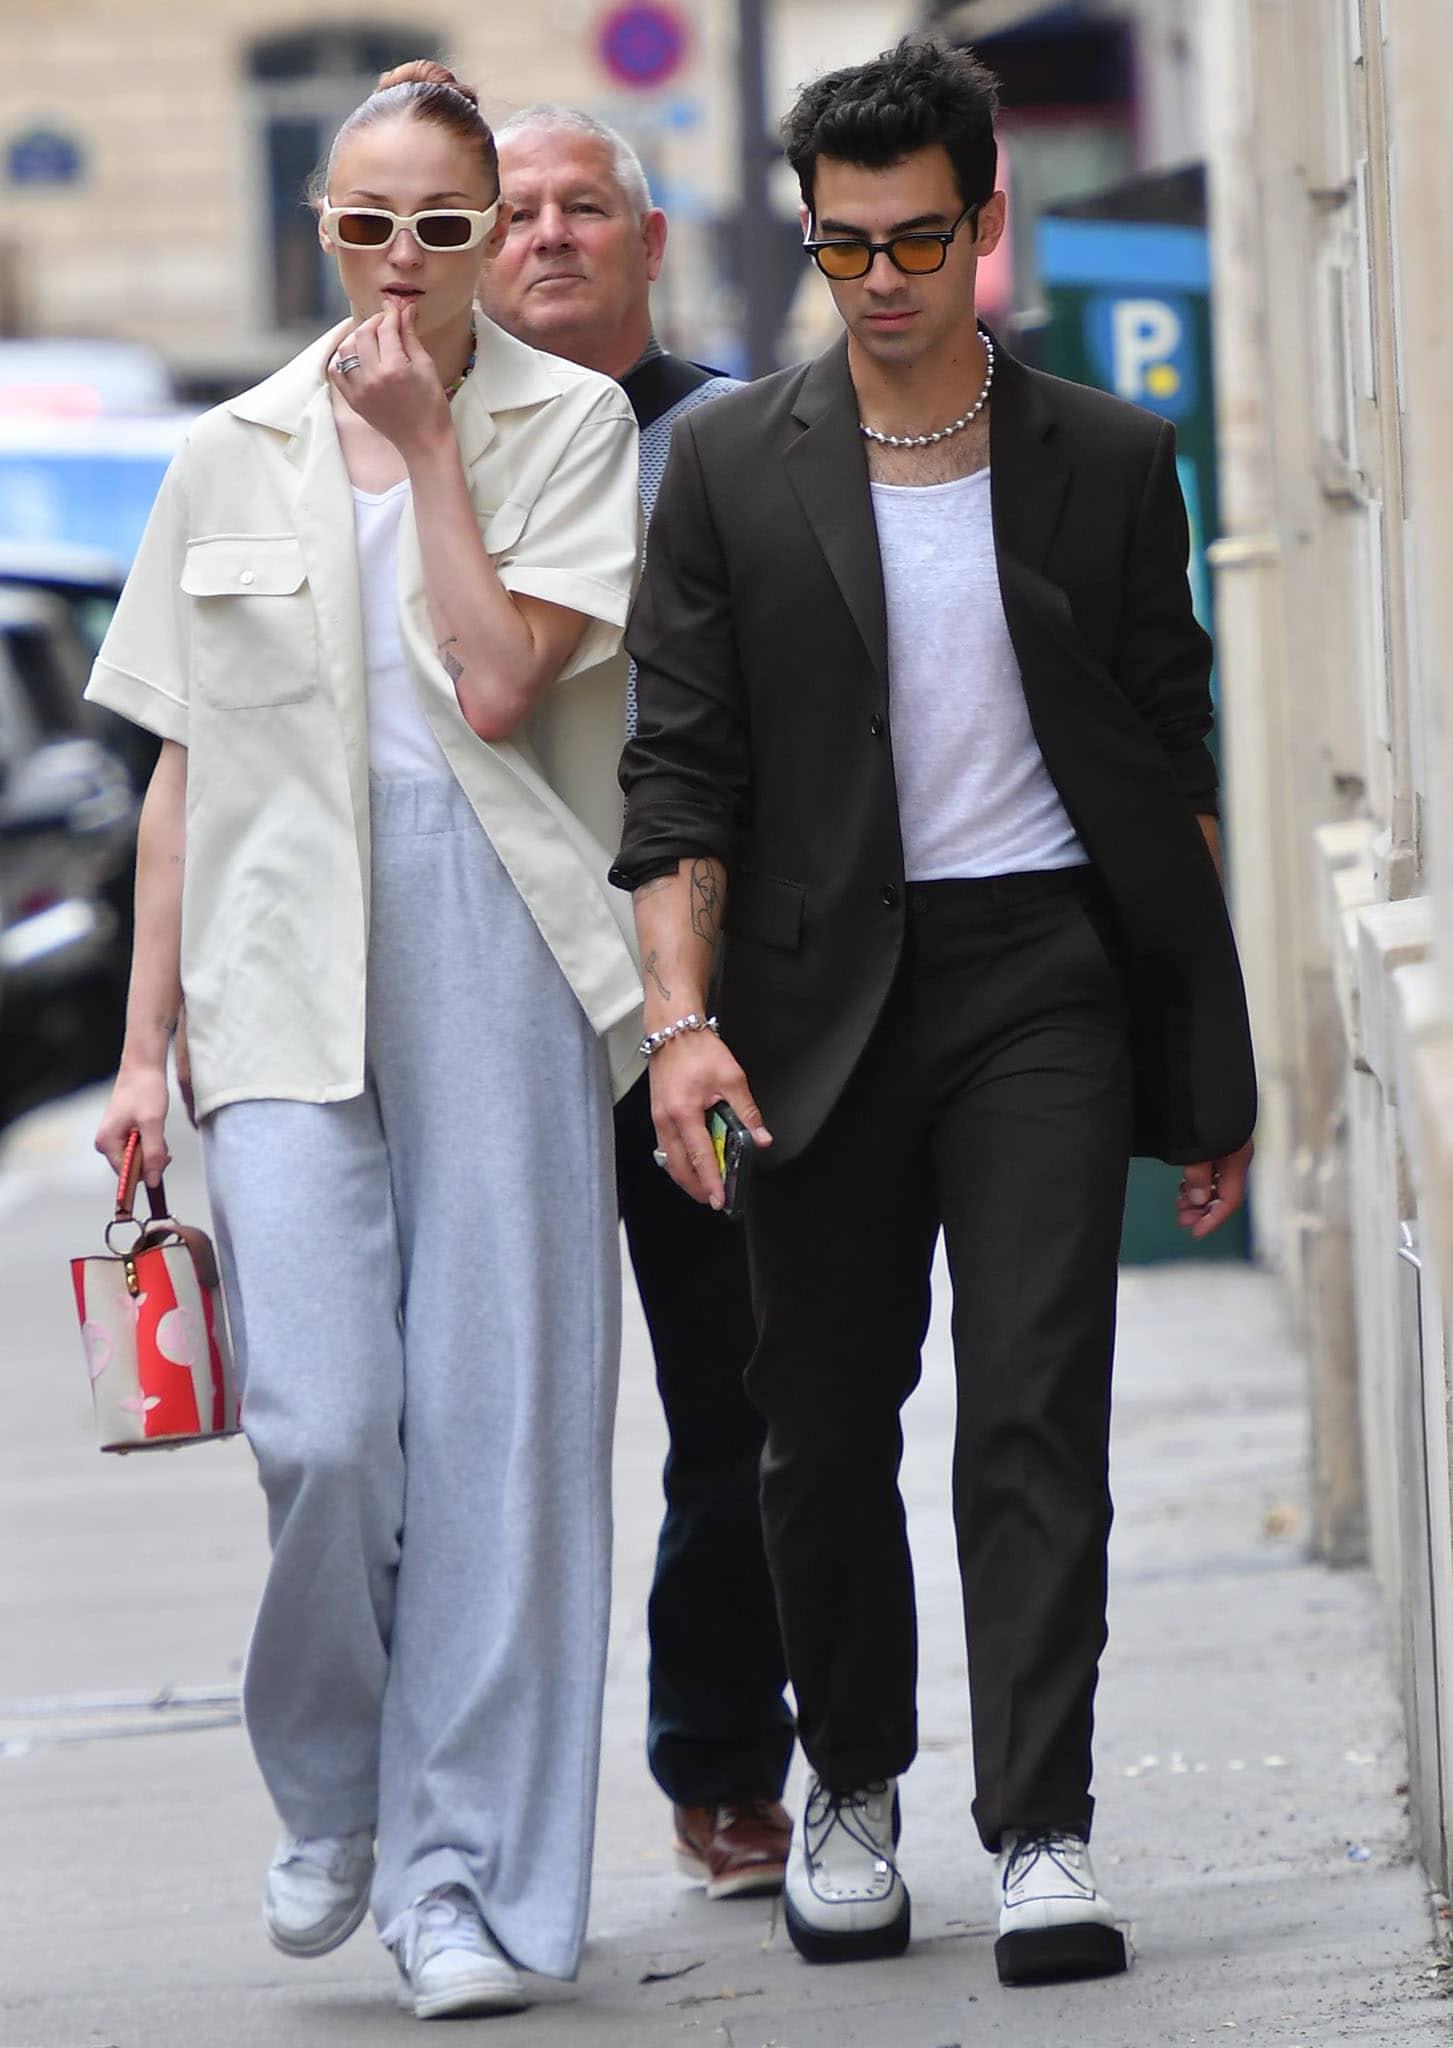 Sophie Turner and Joe Jonas hit the streets of Paris during Paris Fashion Week on July 8, 2021